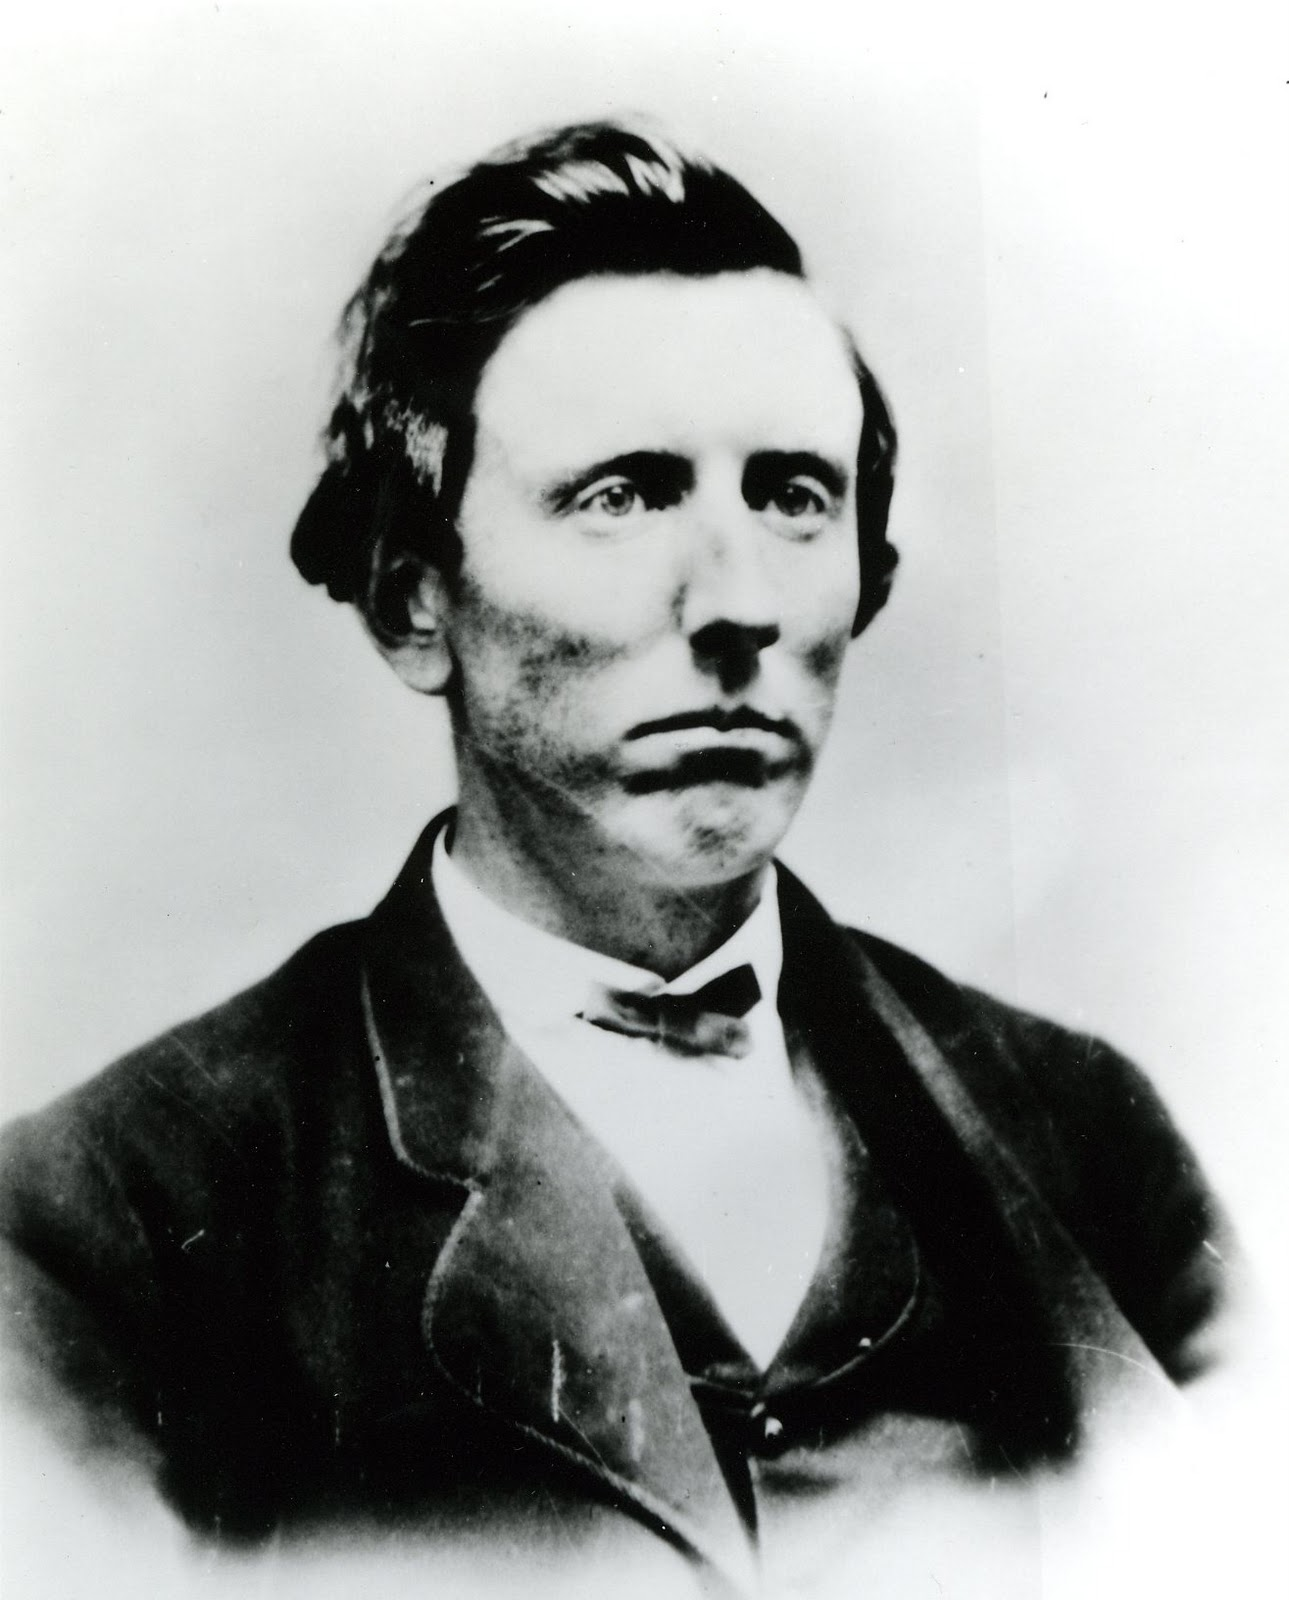 Kansas dickinson county abilene - This Photograph Was Taken Around The Same Time Period That Mccoy Was In Abilene Courtesy Of The Dickinson County Historical Society